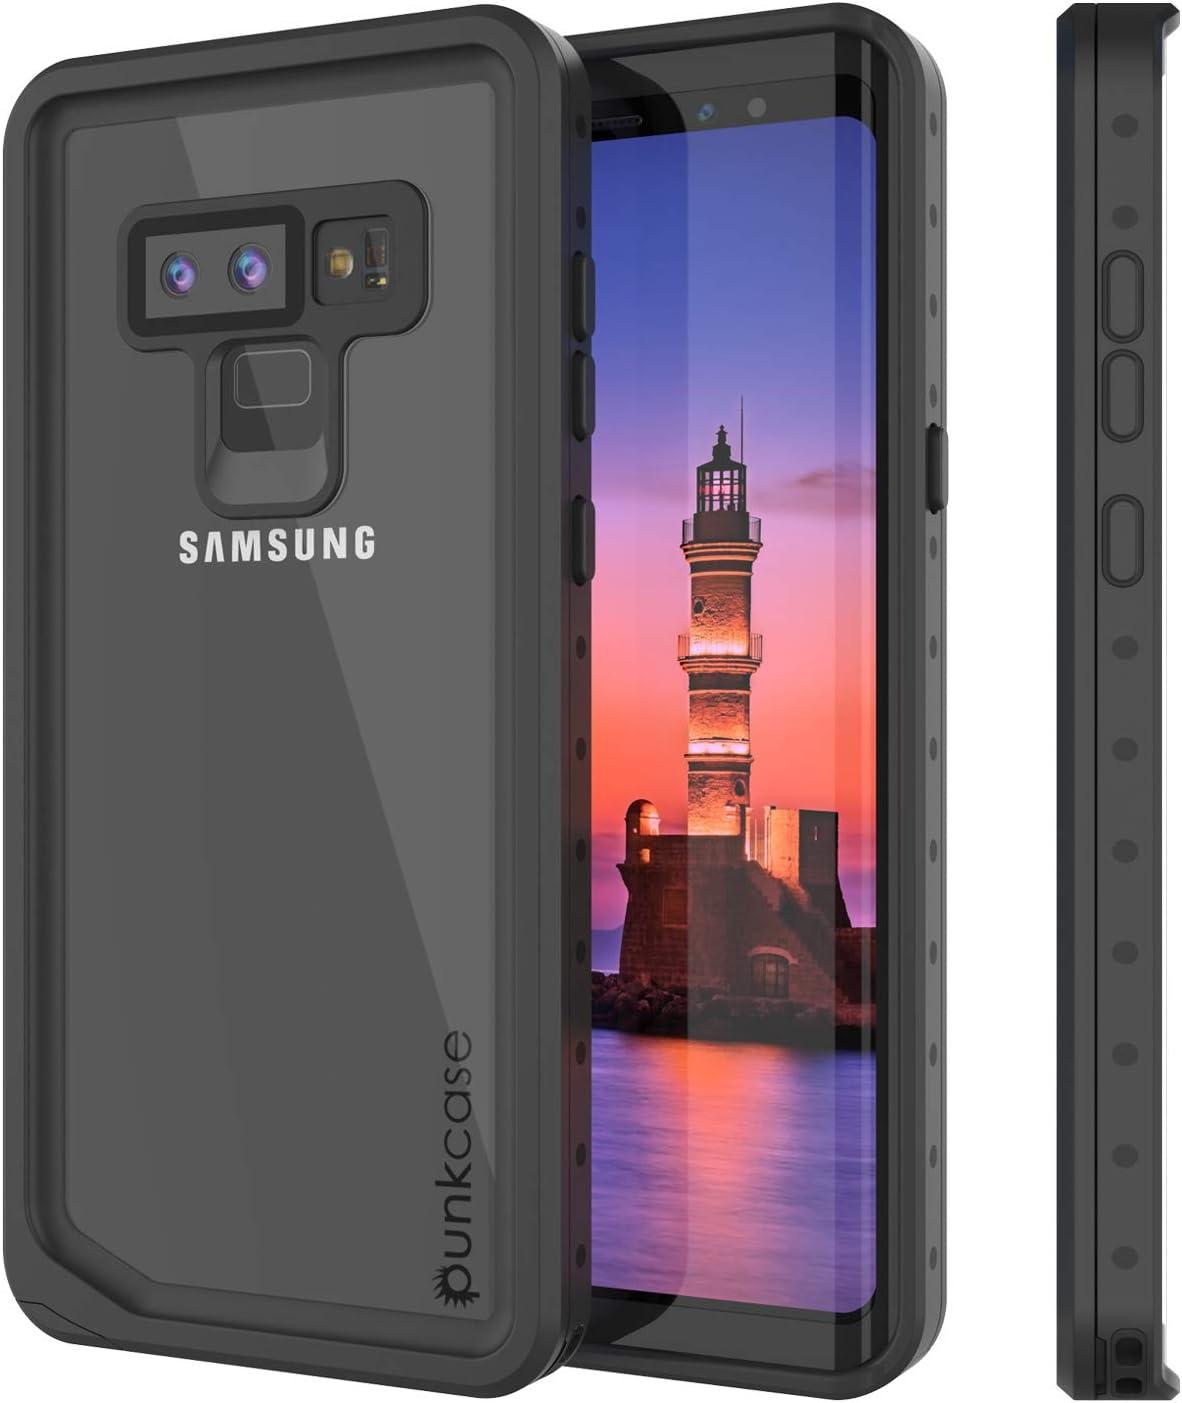 Galaxy Note 9 Waterproof Case, Punkcase [StudStar Series] [Slim Fit] [IP68 Certified] [Shockproof] [Dirtproof] [Snowproof] Armor Cover for Samsung Galaxy Note 9 [Clear]